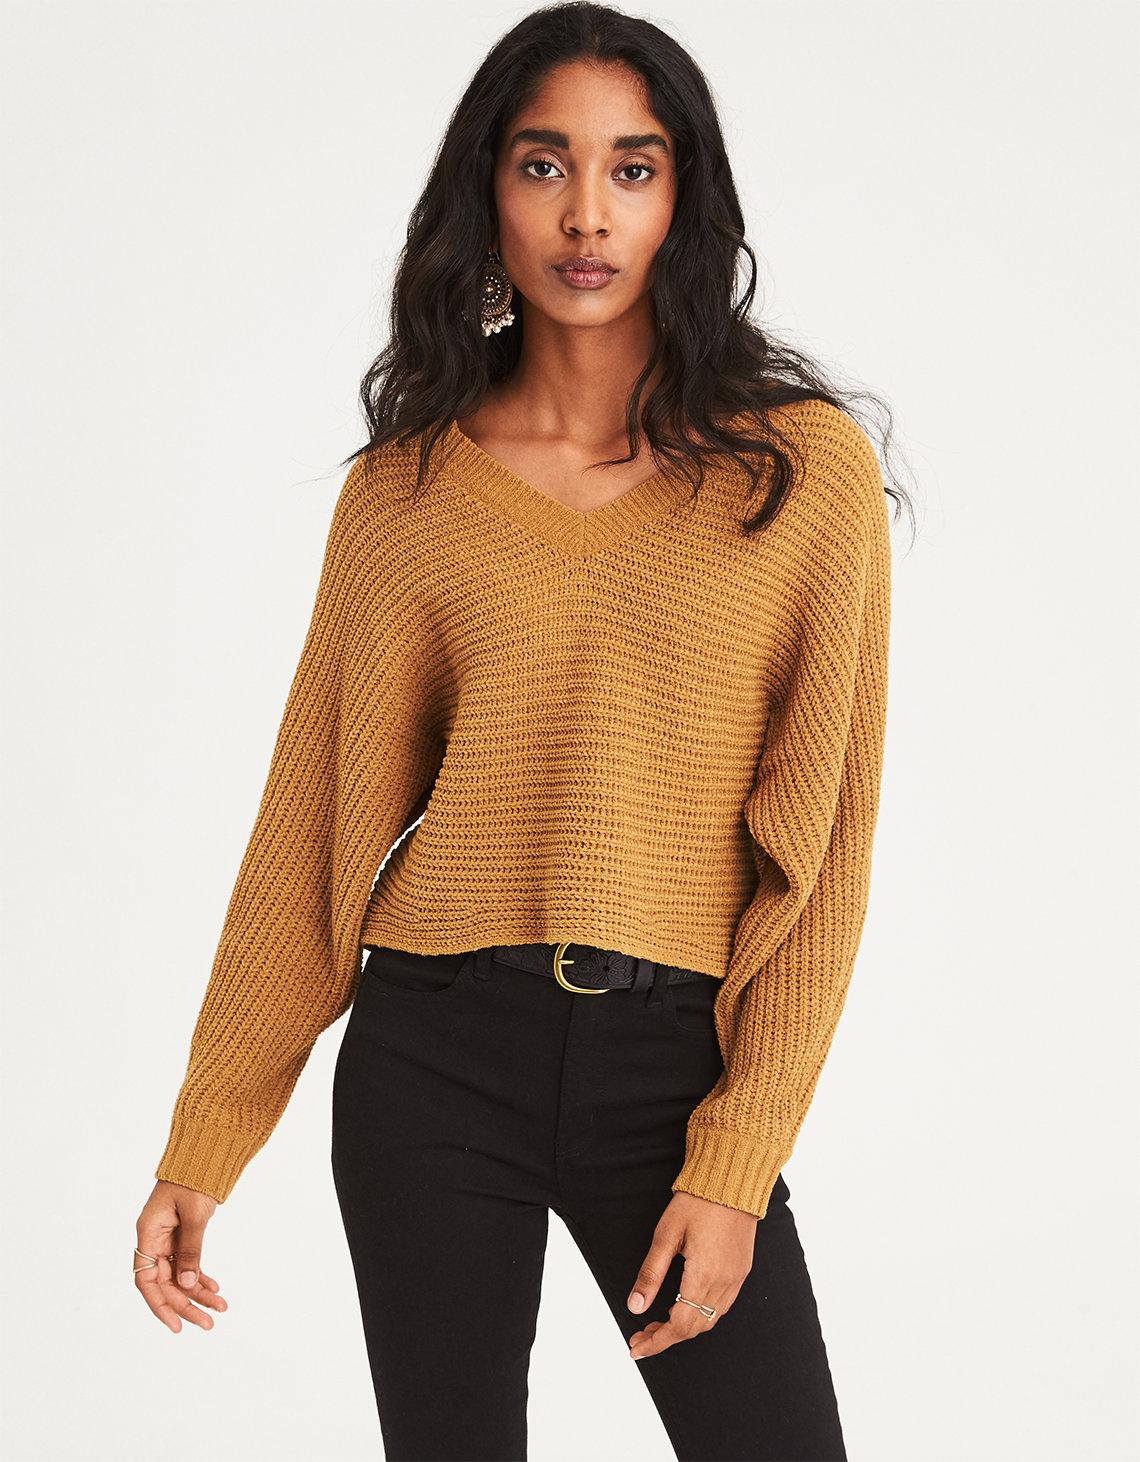 V-Neck Cropped Sweater